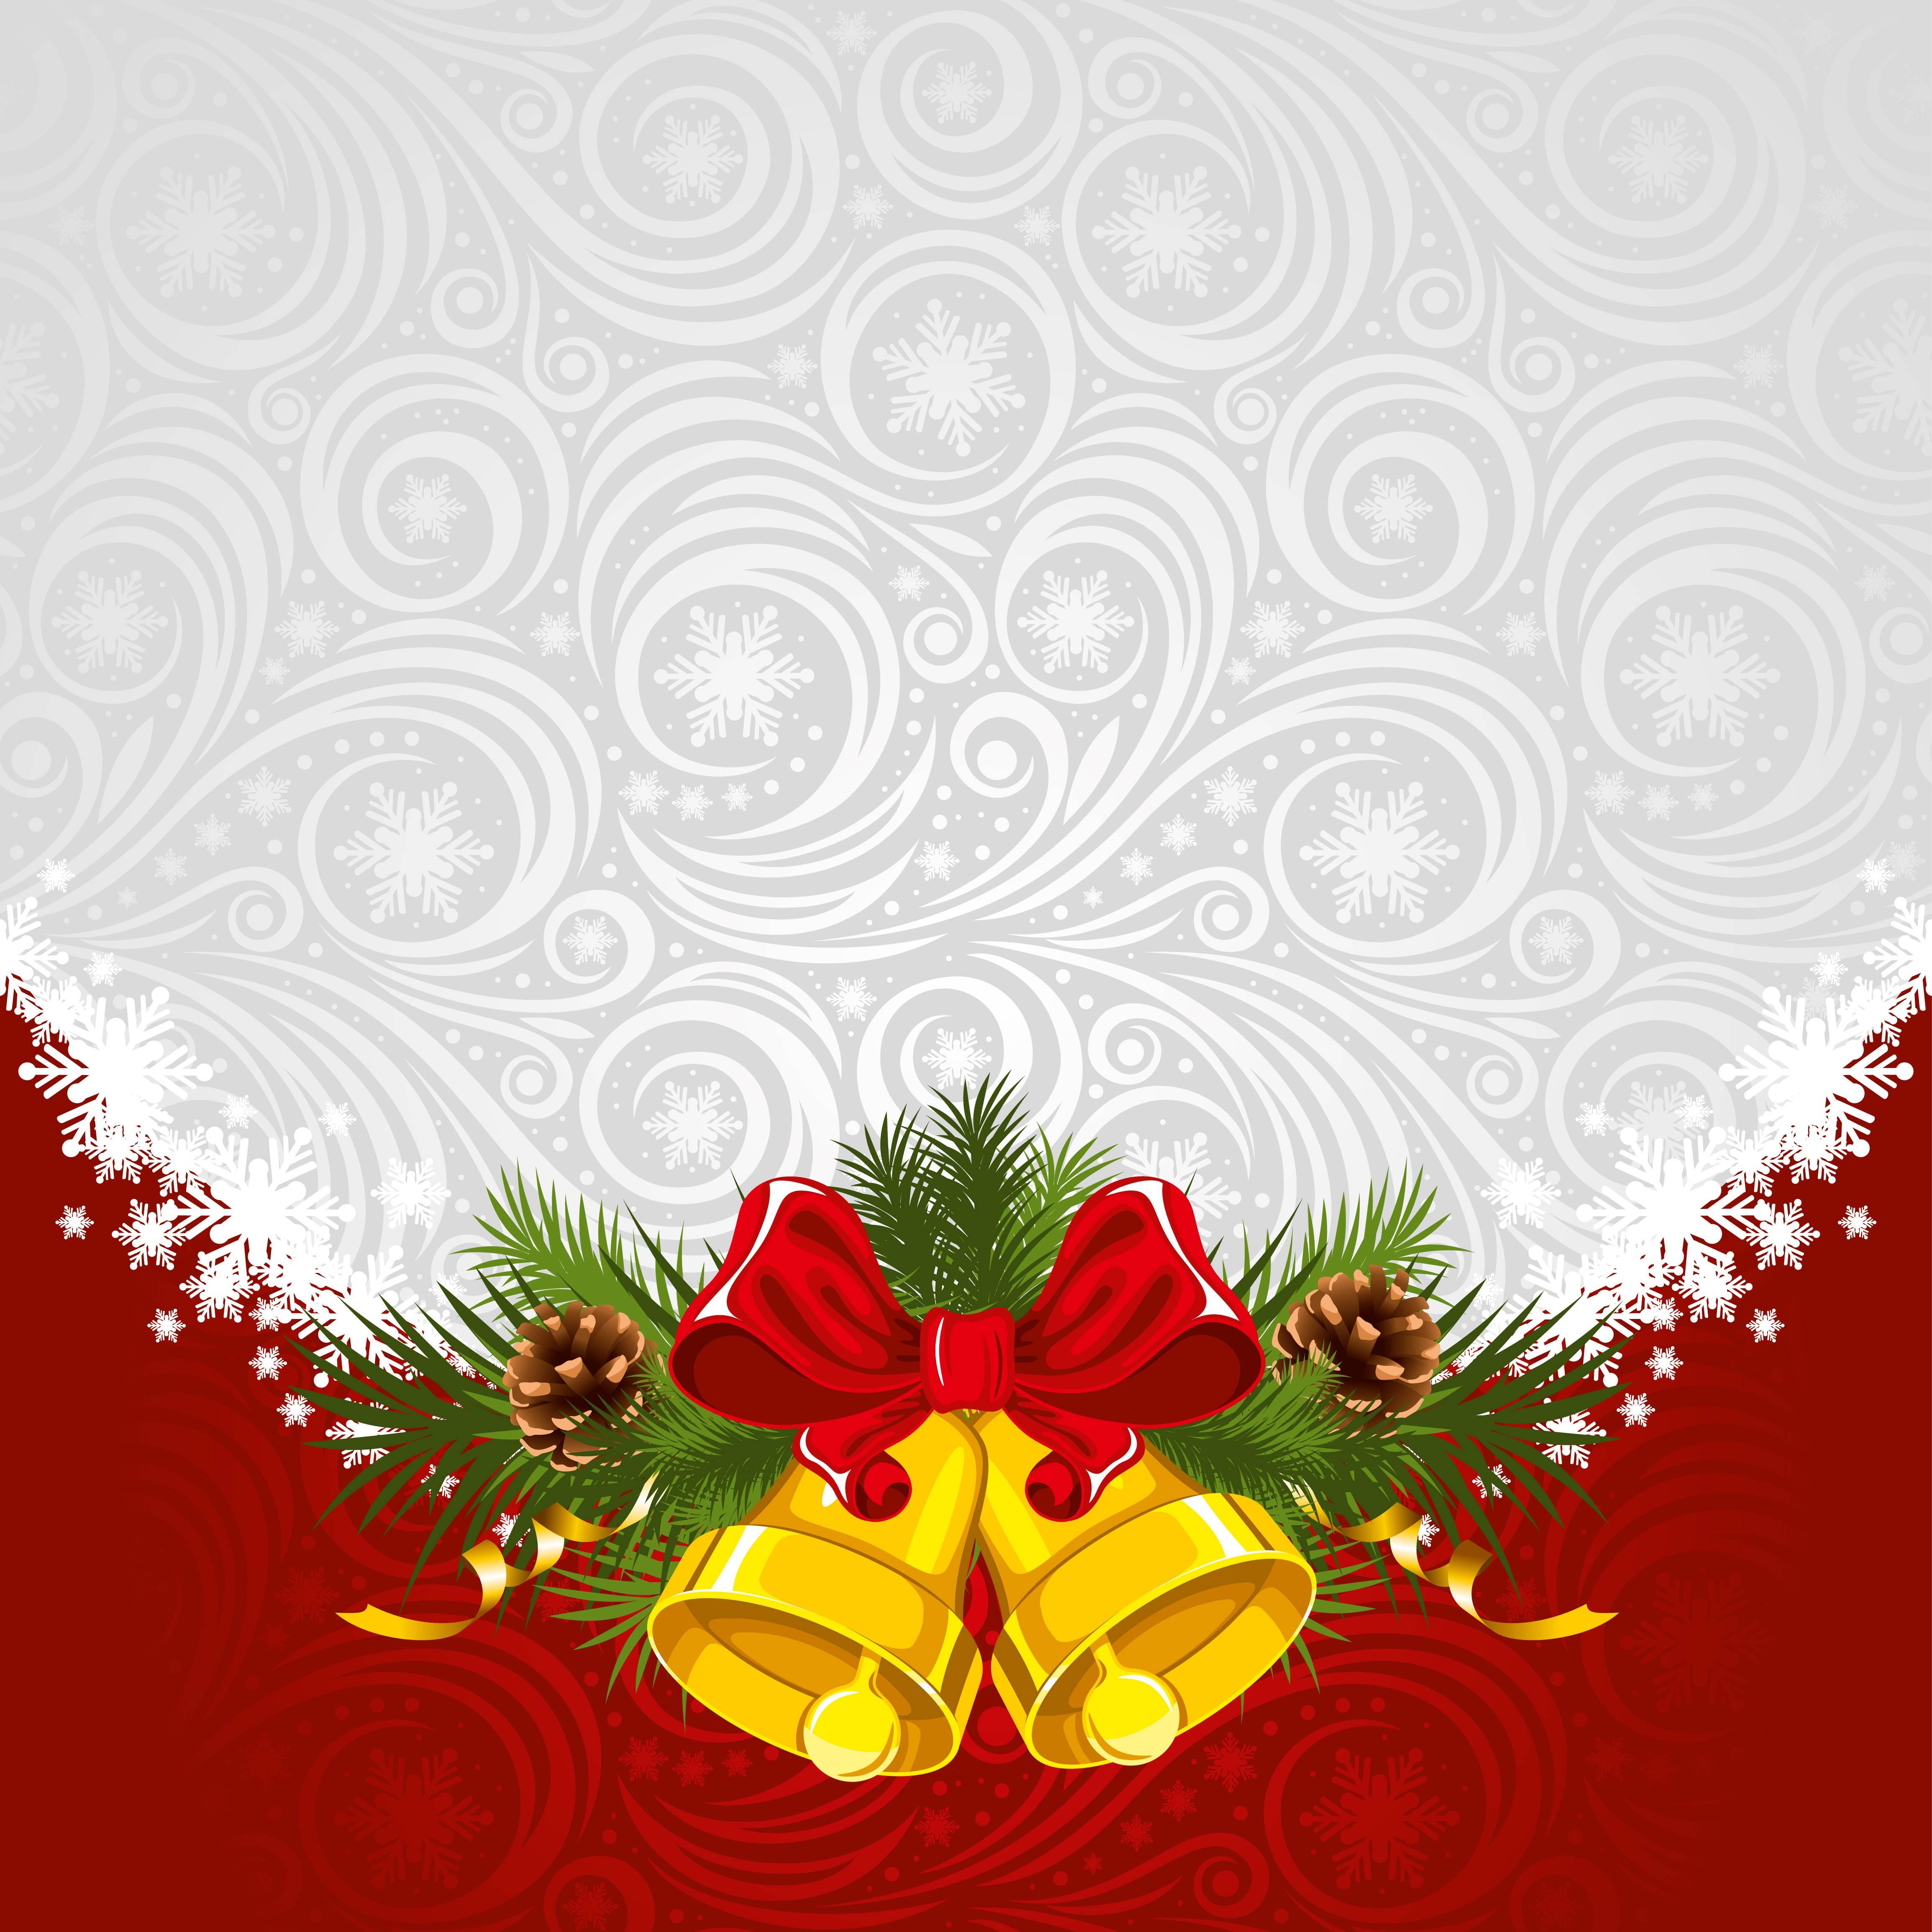 Christmas Backgrounds Image 4618x4617